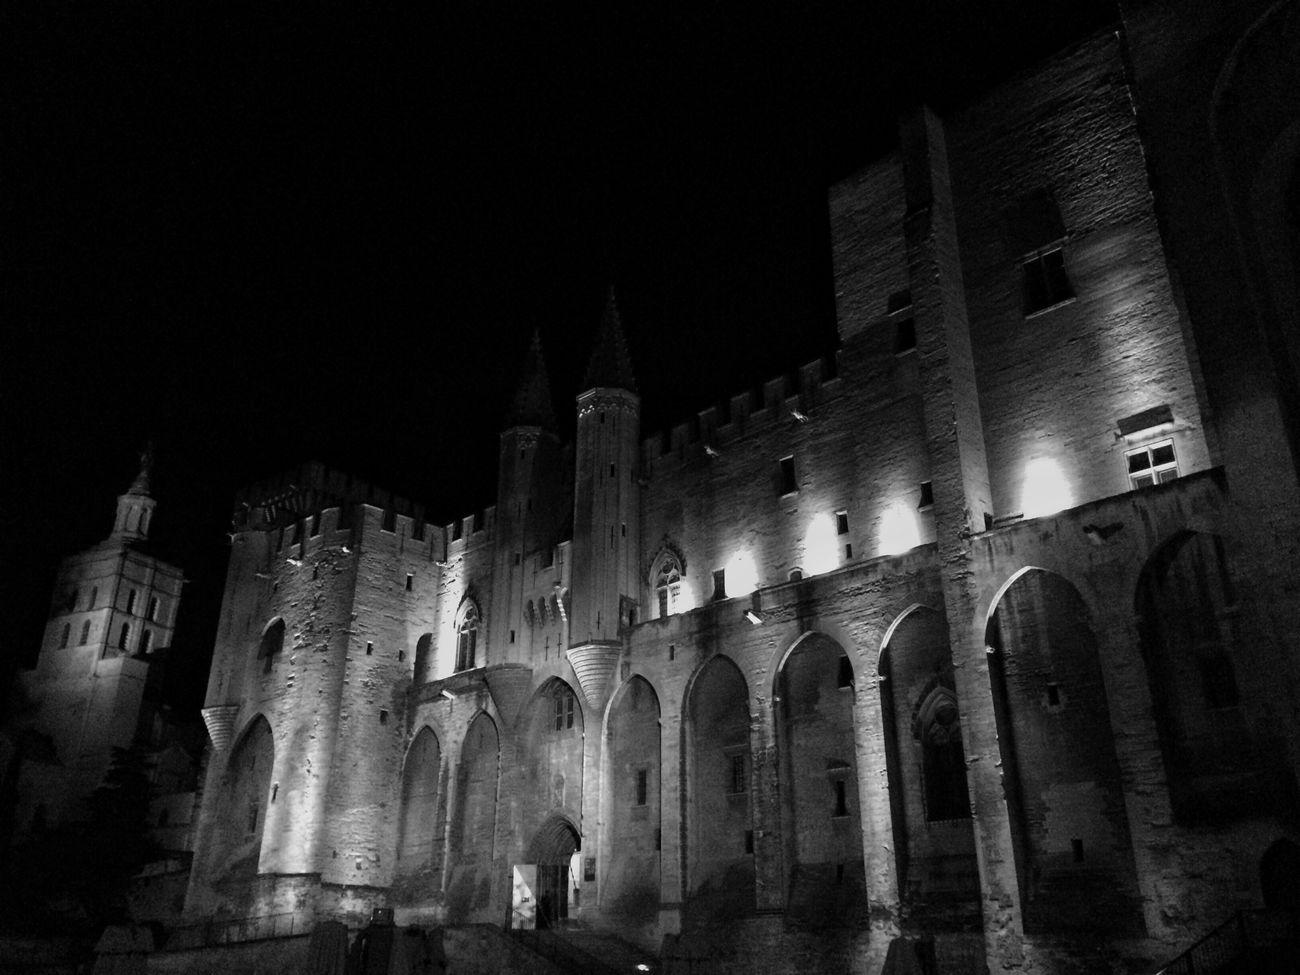 Blackandwhite Travelling Black And White Monochrome Blackandwhite Photography Bw_collection Bw_lover NEM Black&white Black & White Fortheloveofblackandwhite Architecture Streetphoto_bw